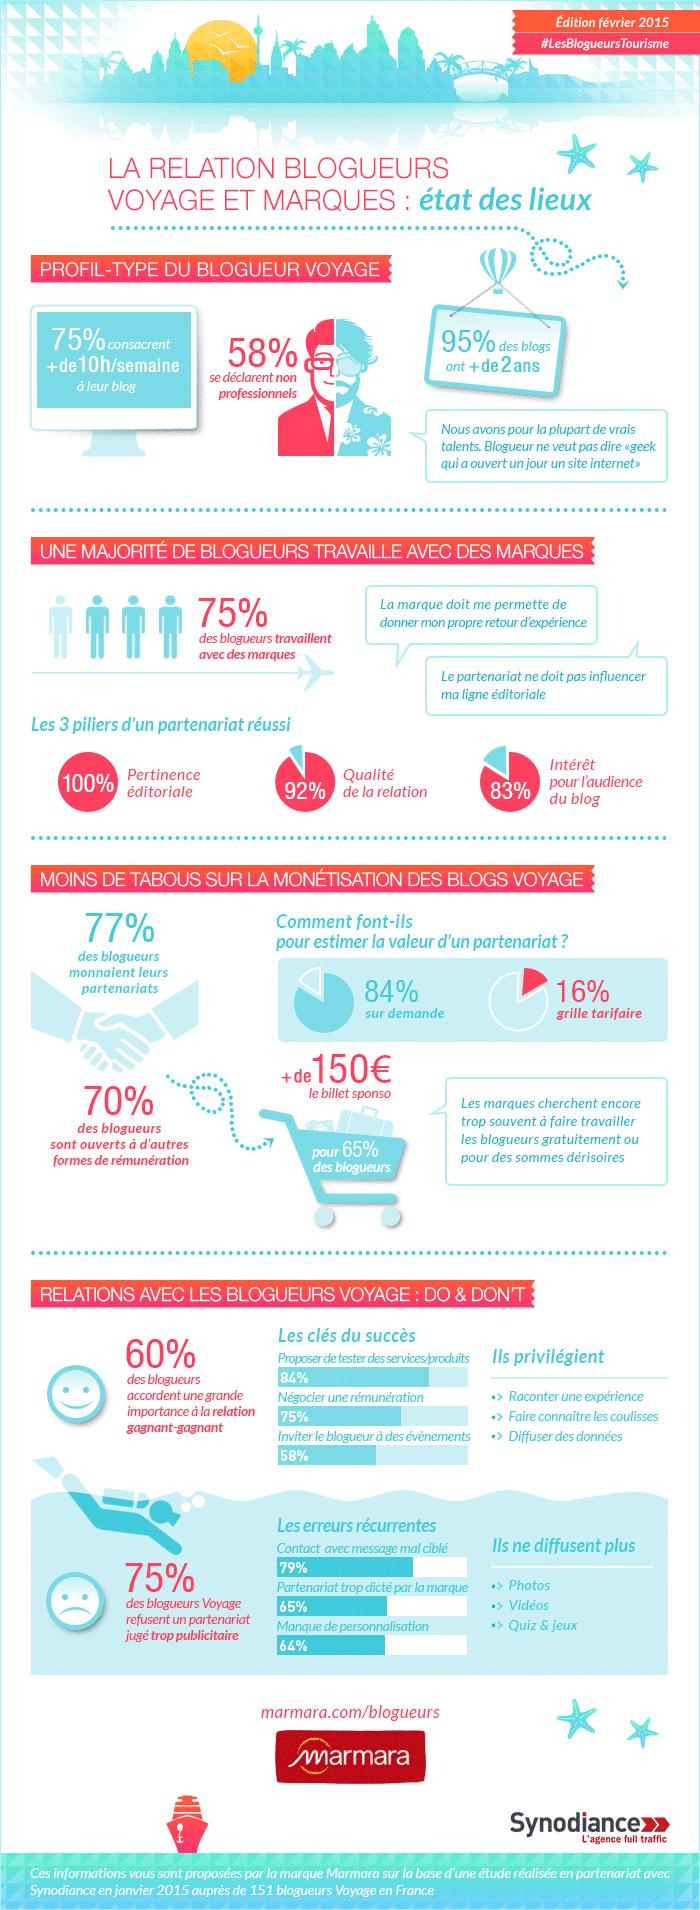 infographie-etude-blogueur-marmara-synodiance-2015